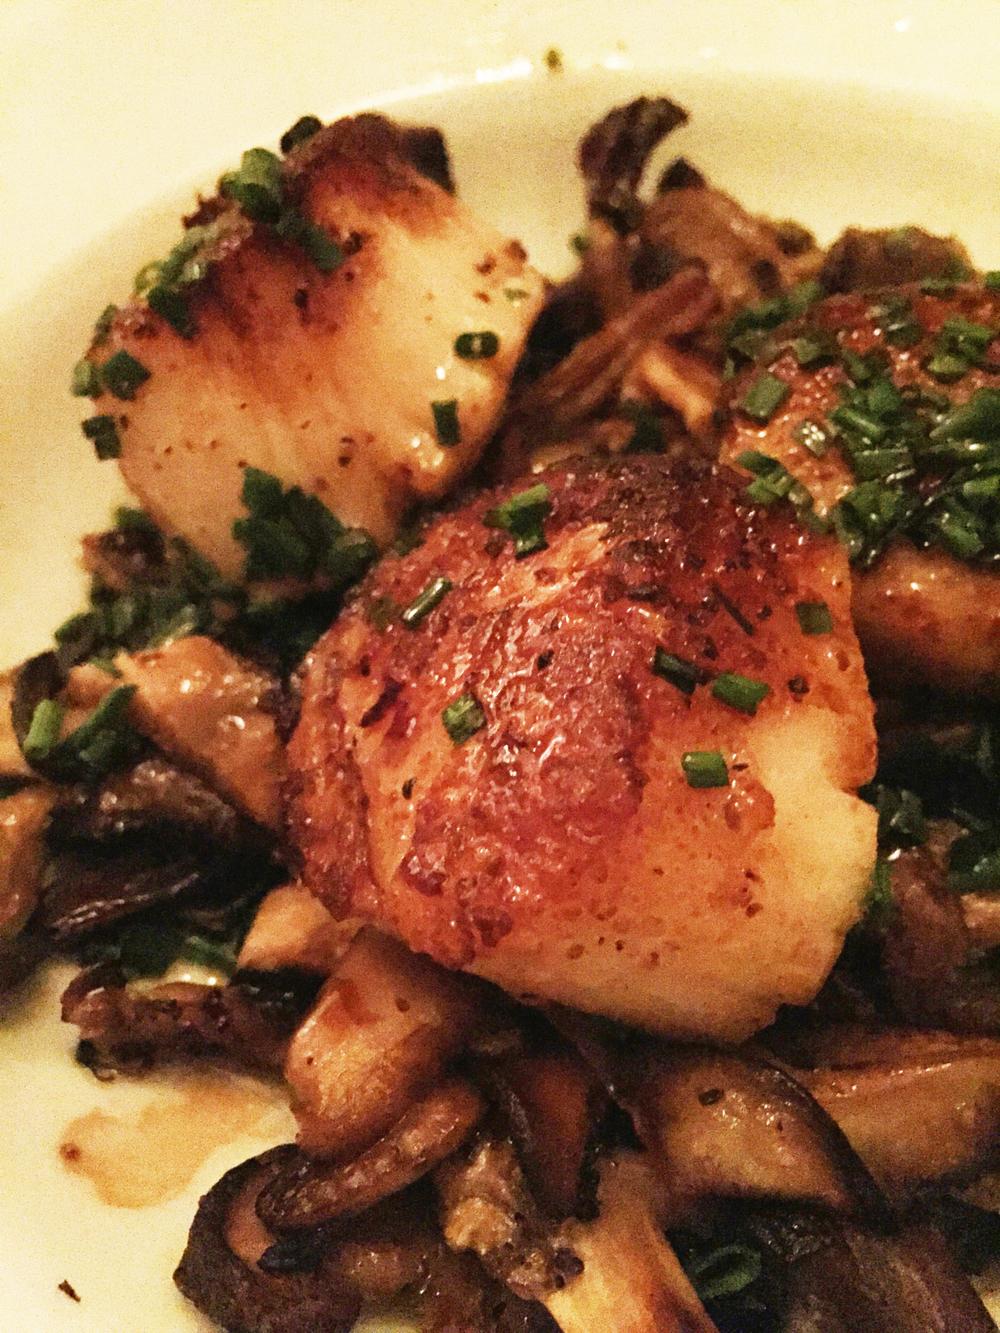 Sauteed Scallops, Mushrooms, Aged Balsamic Vinegar